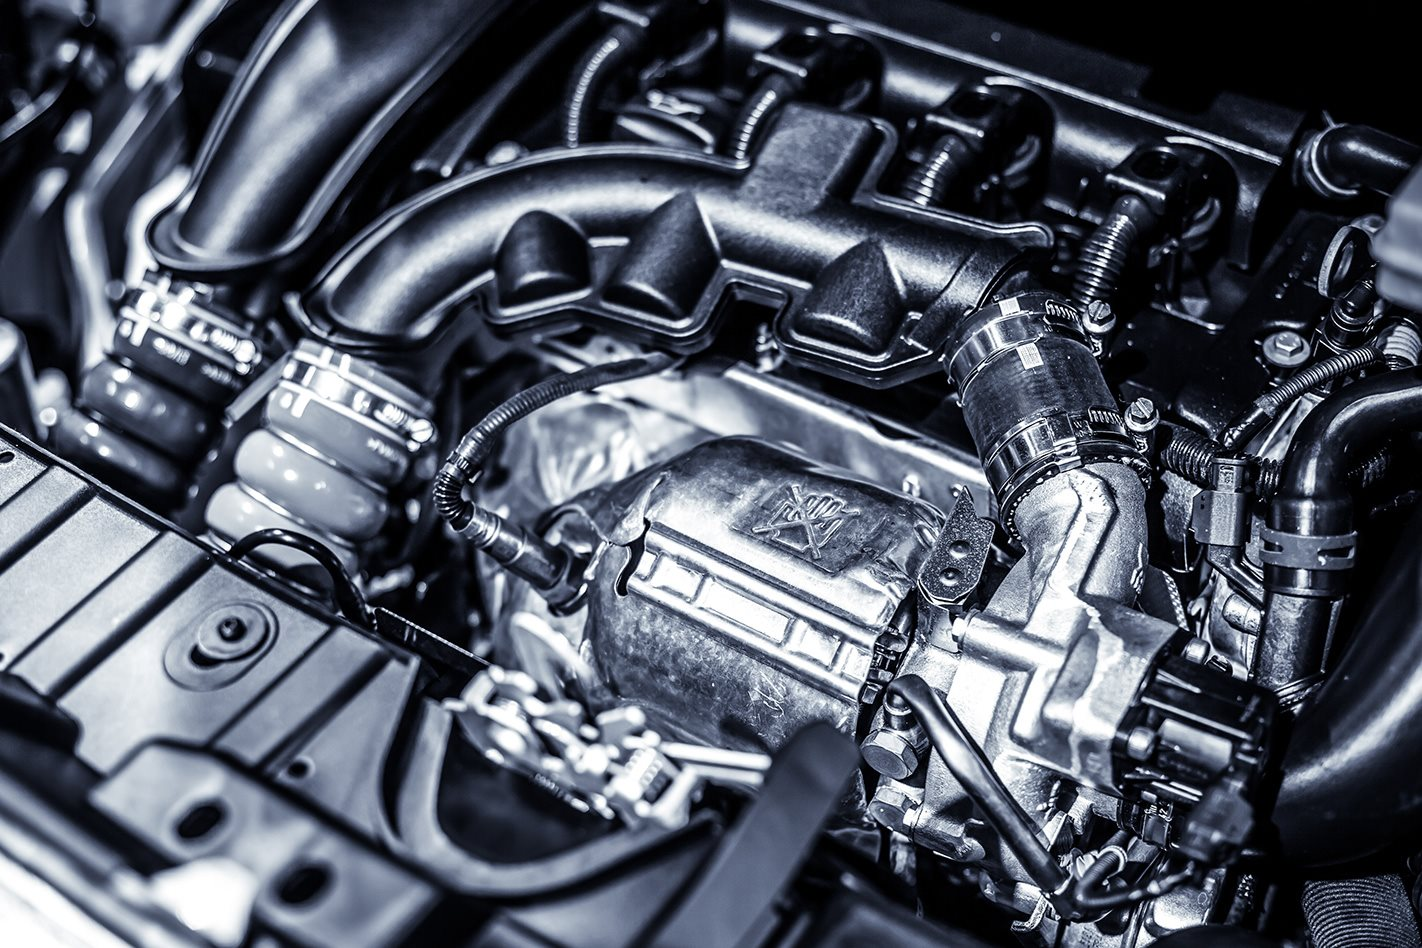 Motor close-up